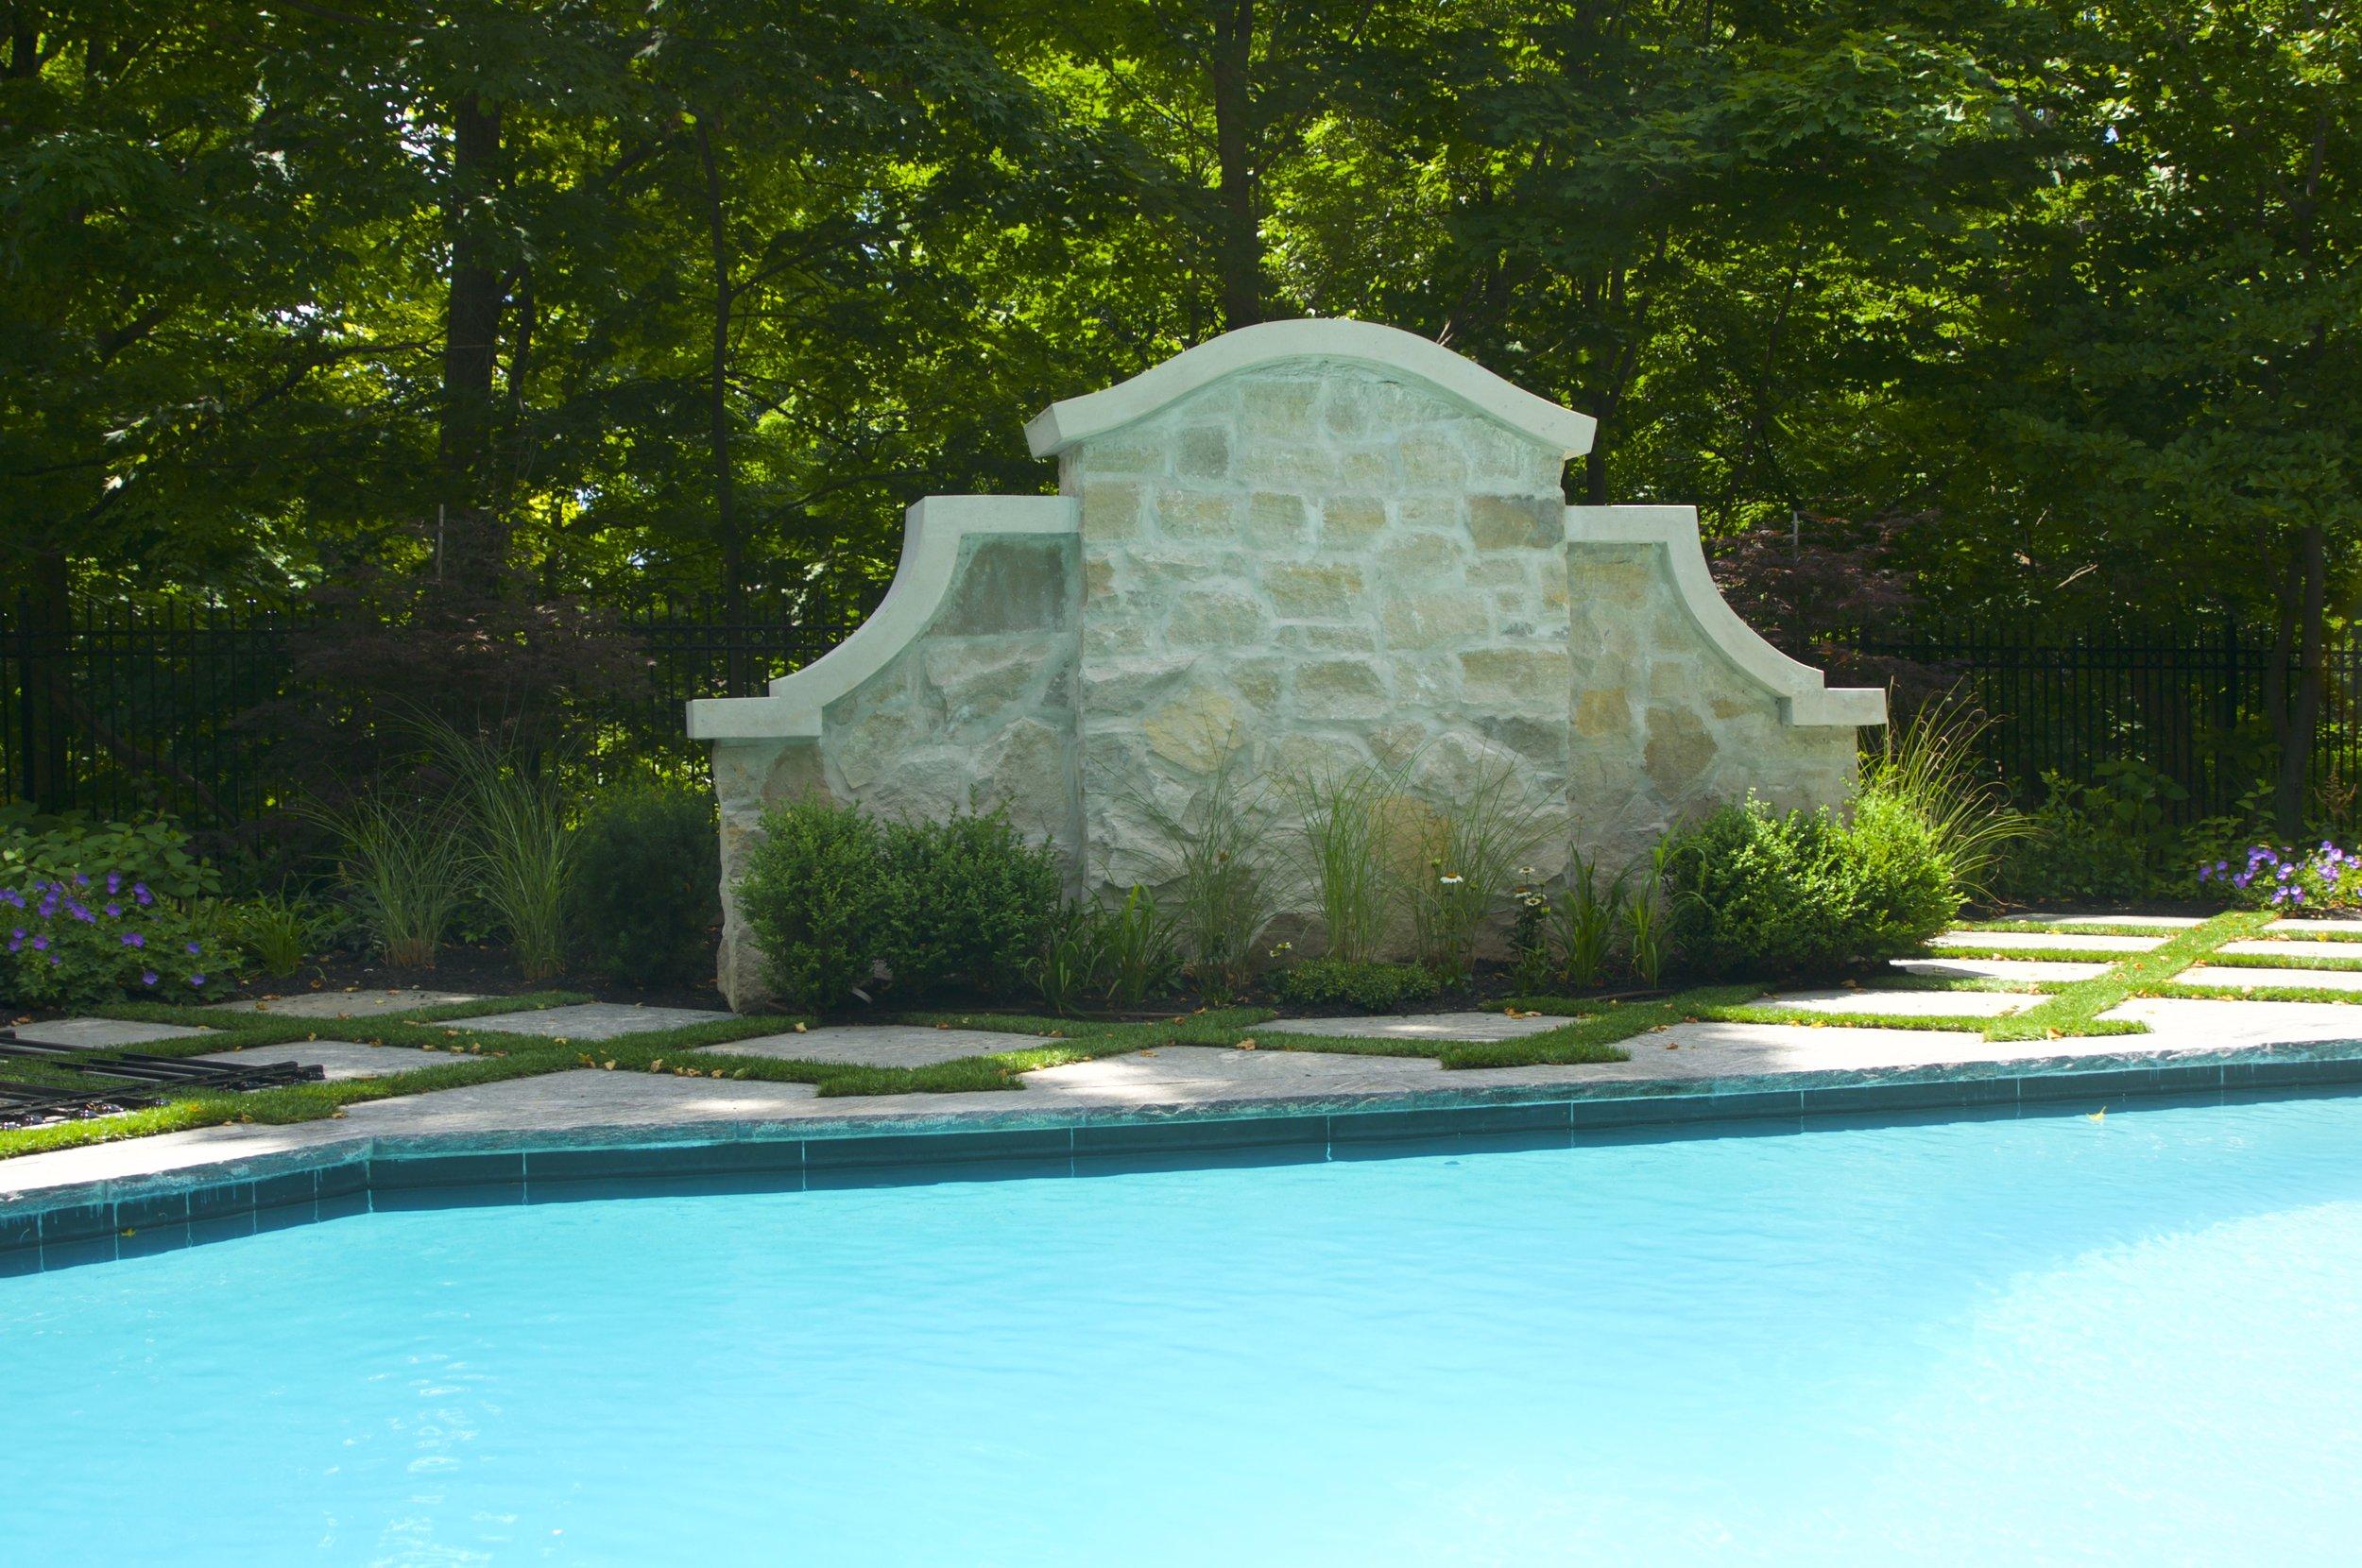 landscaping, precast copping, ornamental grasses, custom stonework, artificial turf, granite, toronto, yews, outdoor furniture, pool, trex decking, planting